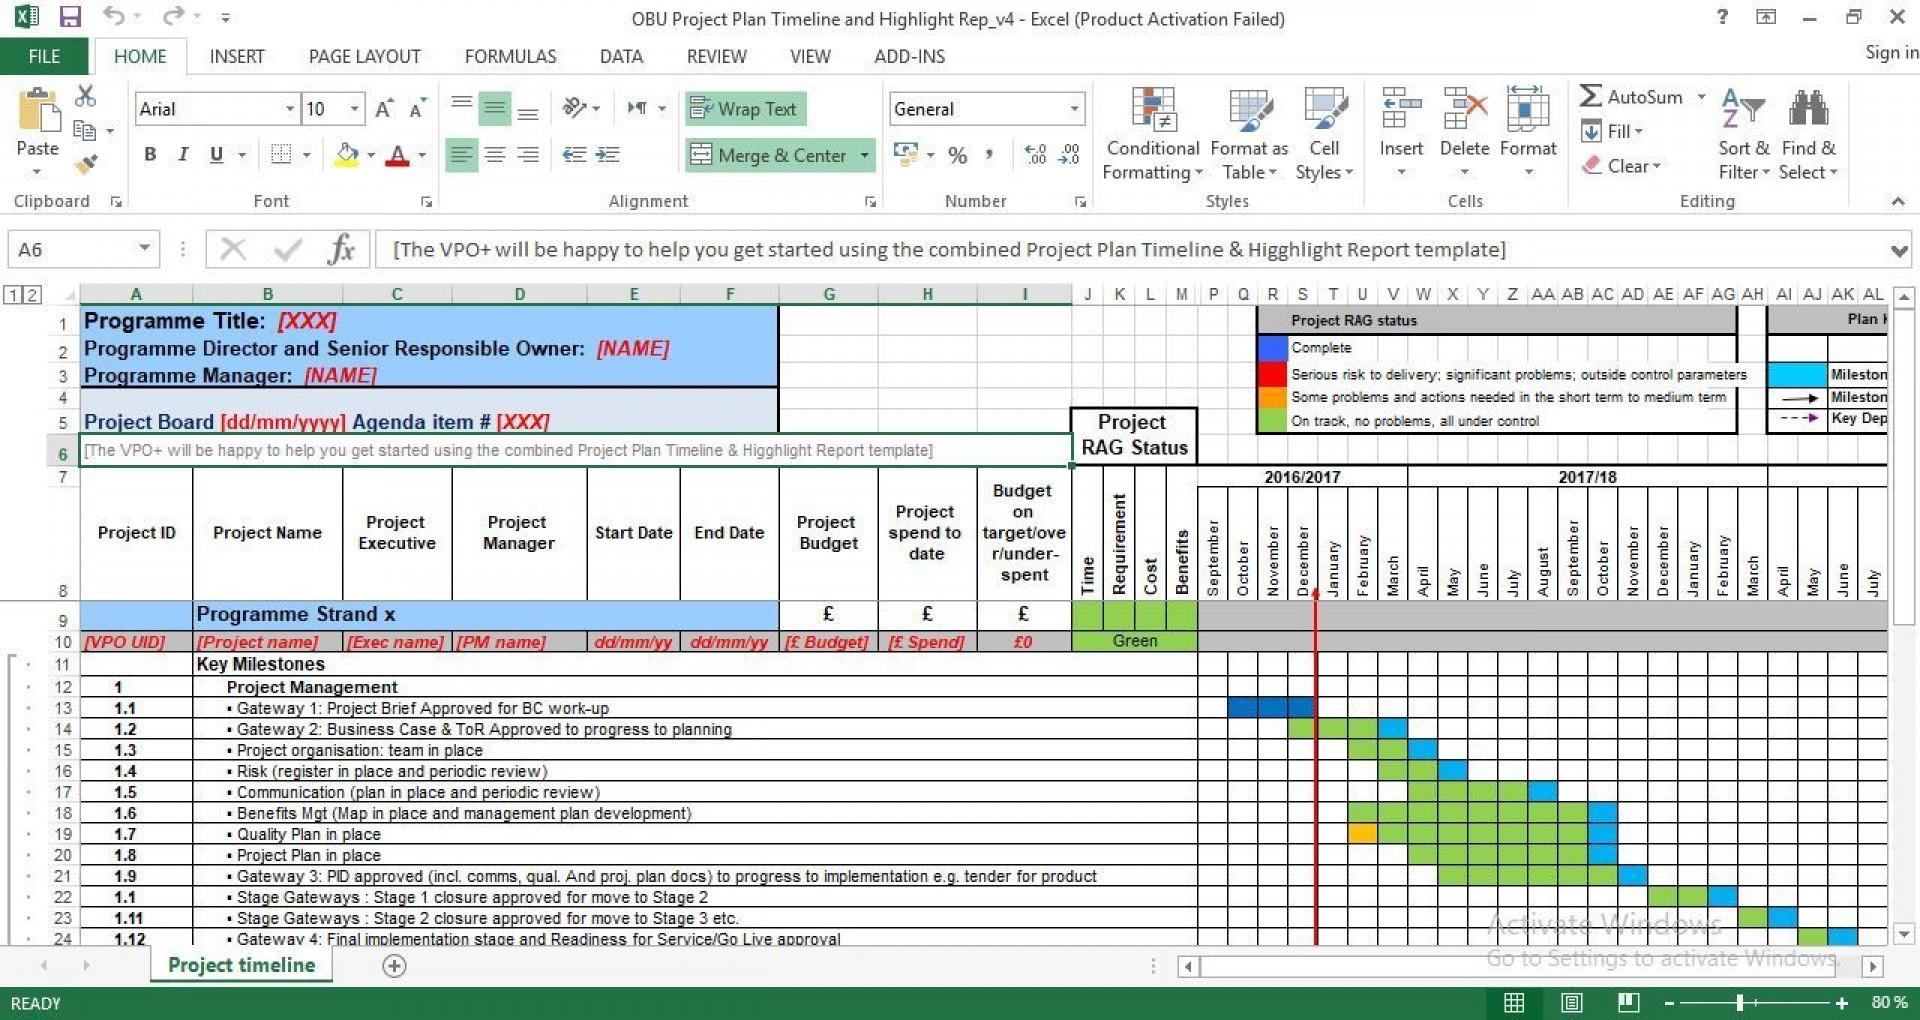 008 Unbelievable Project Management Timeline Template Excel High Def  Free1920